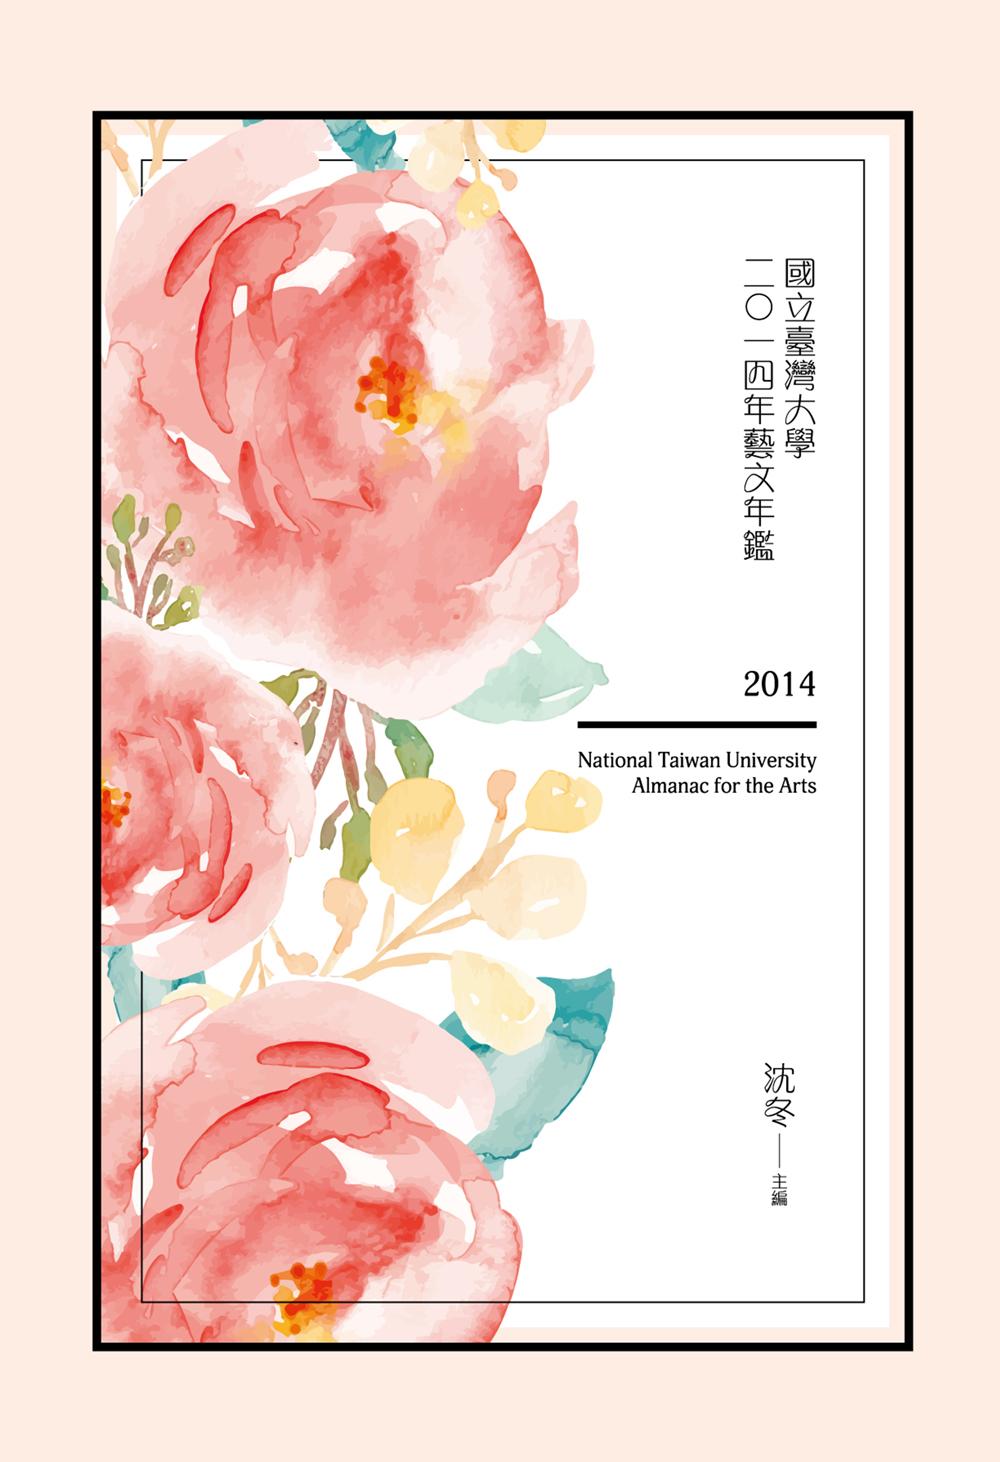 National Taiwan University Almanac for the Arts, 2014